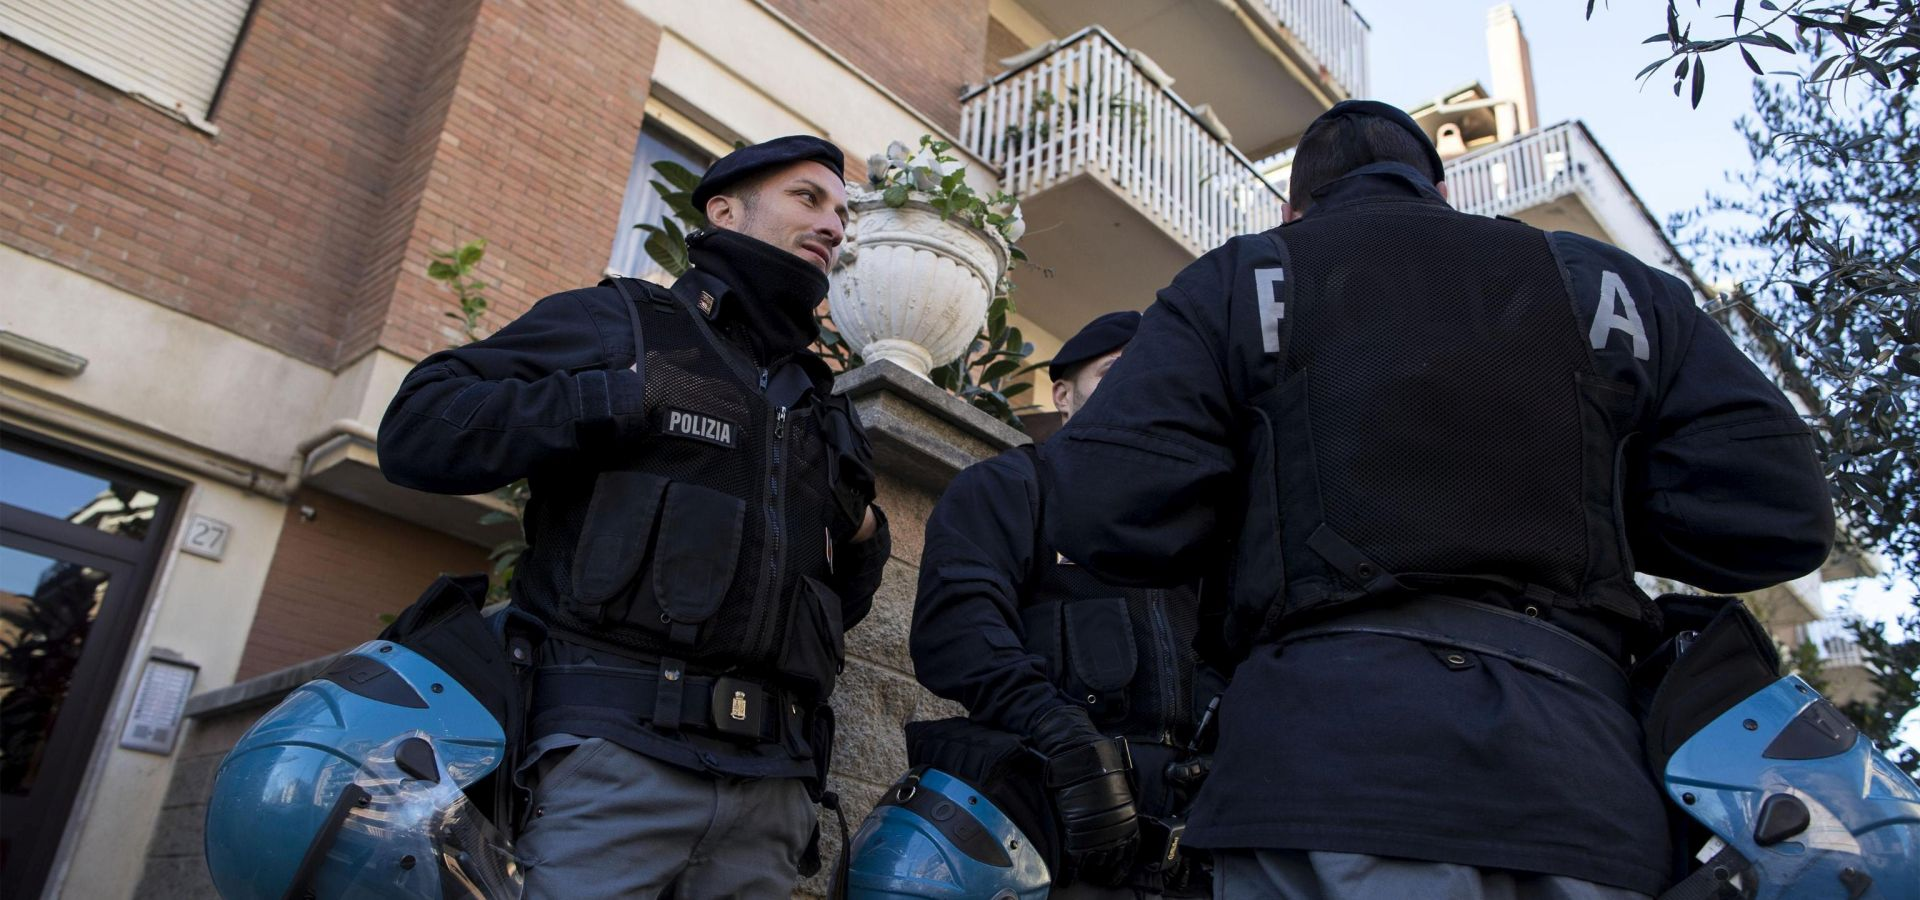 Uhićen jedan od vođa 'Ndranghete